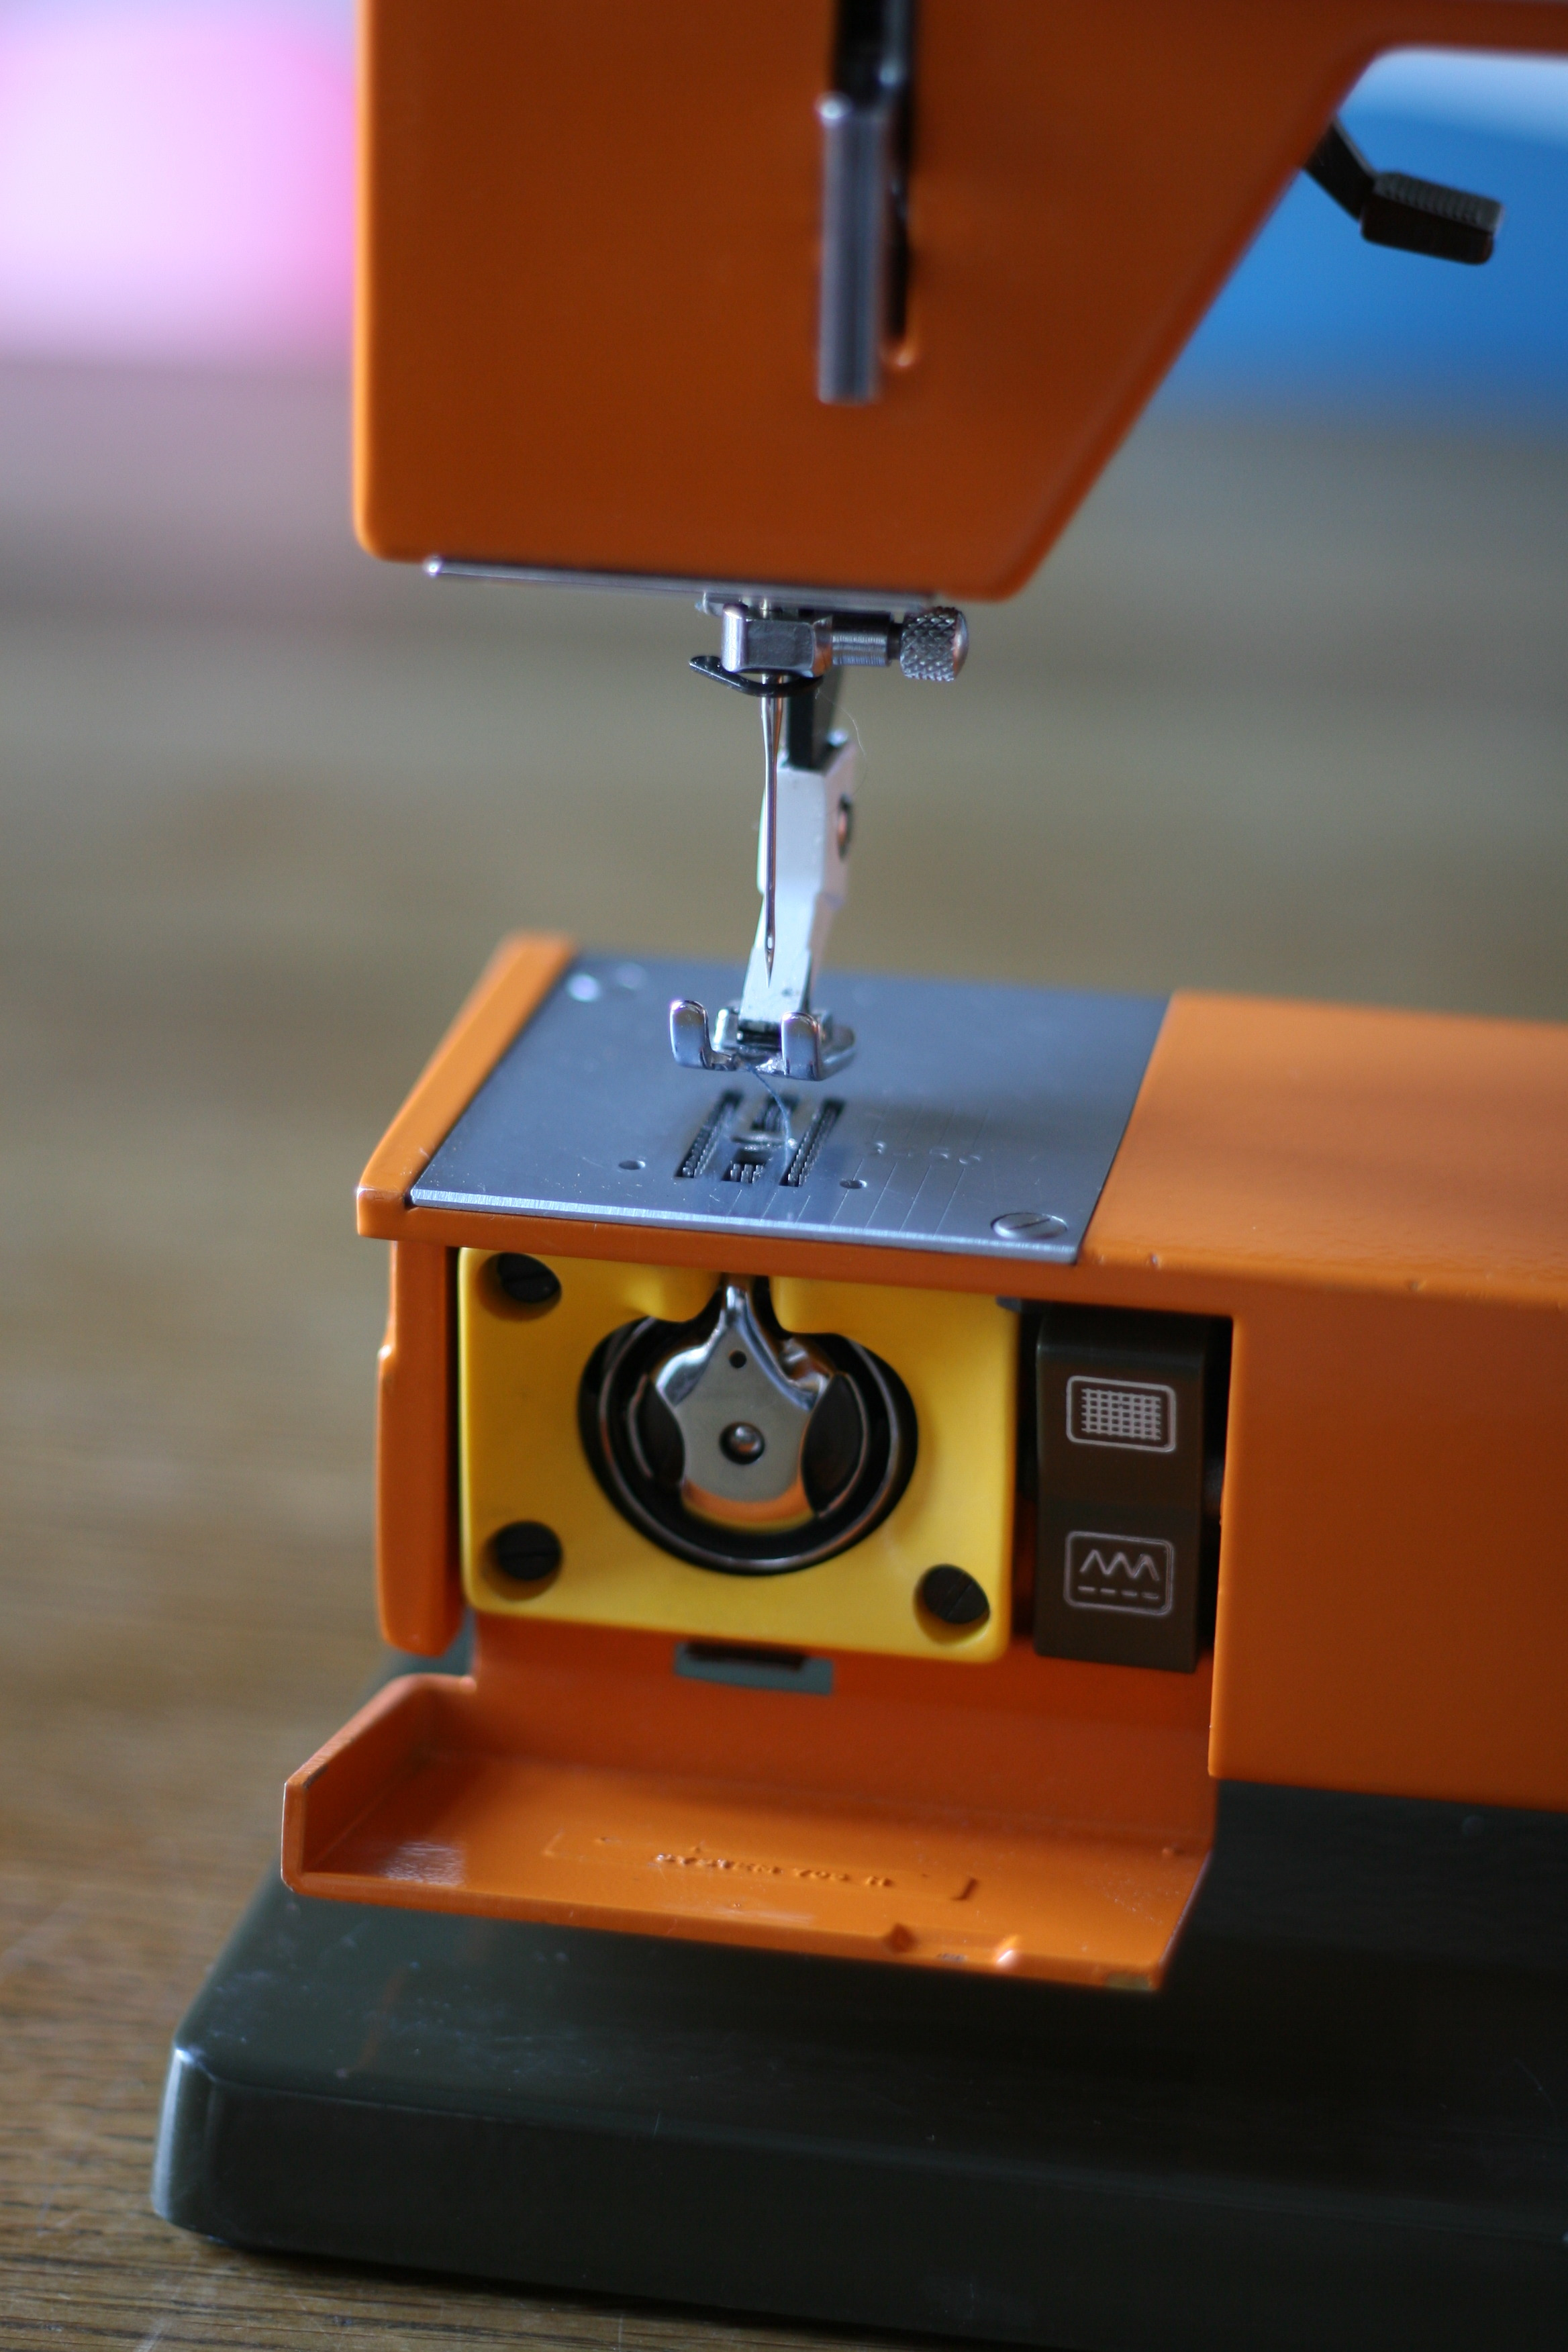 husqvarna 3600 sewing machine manual